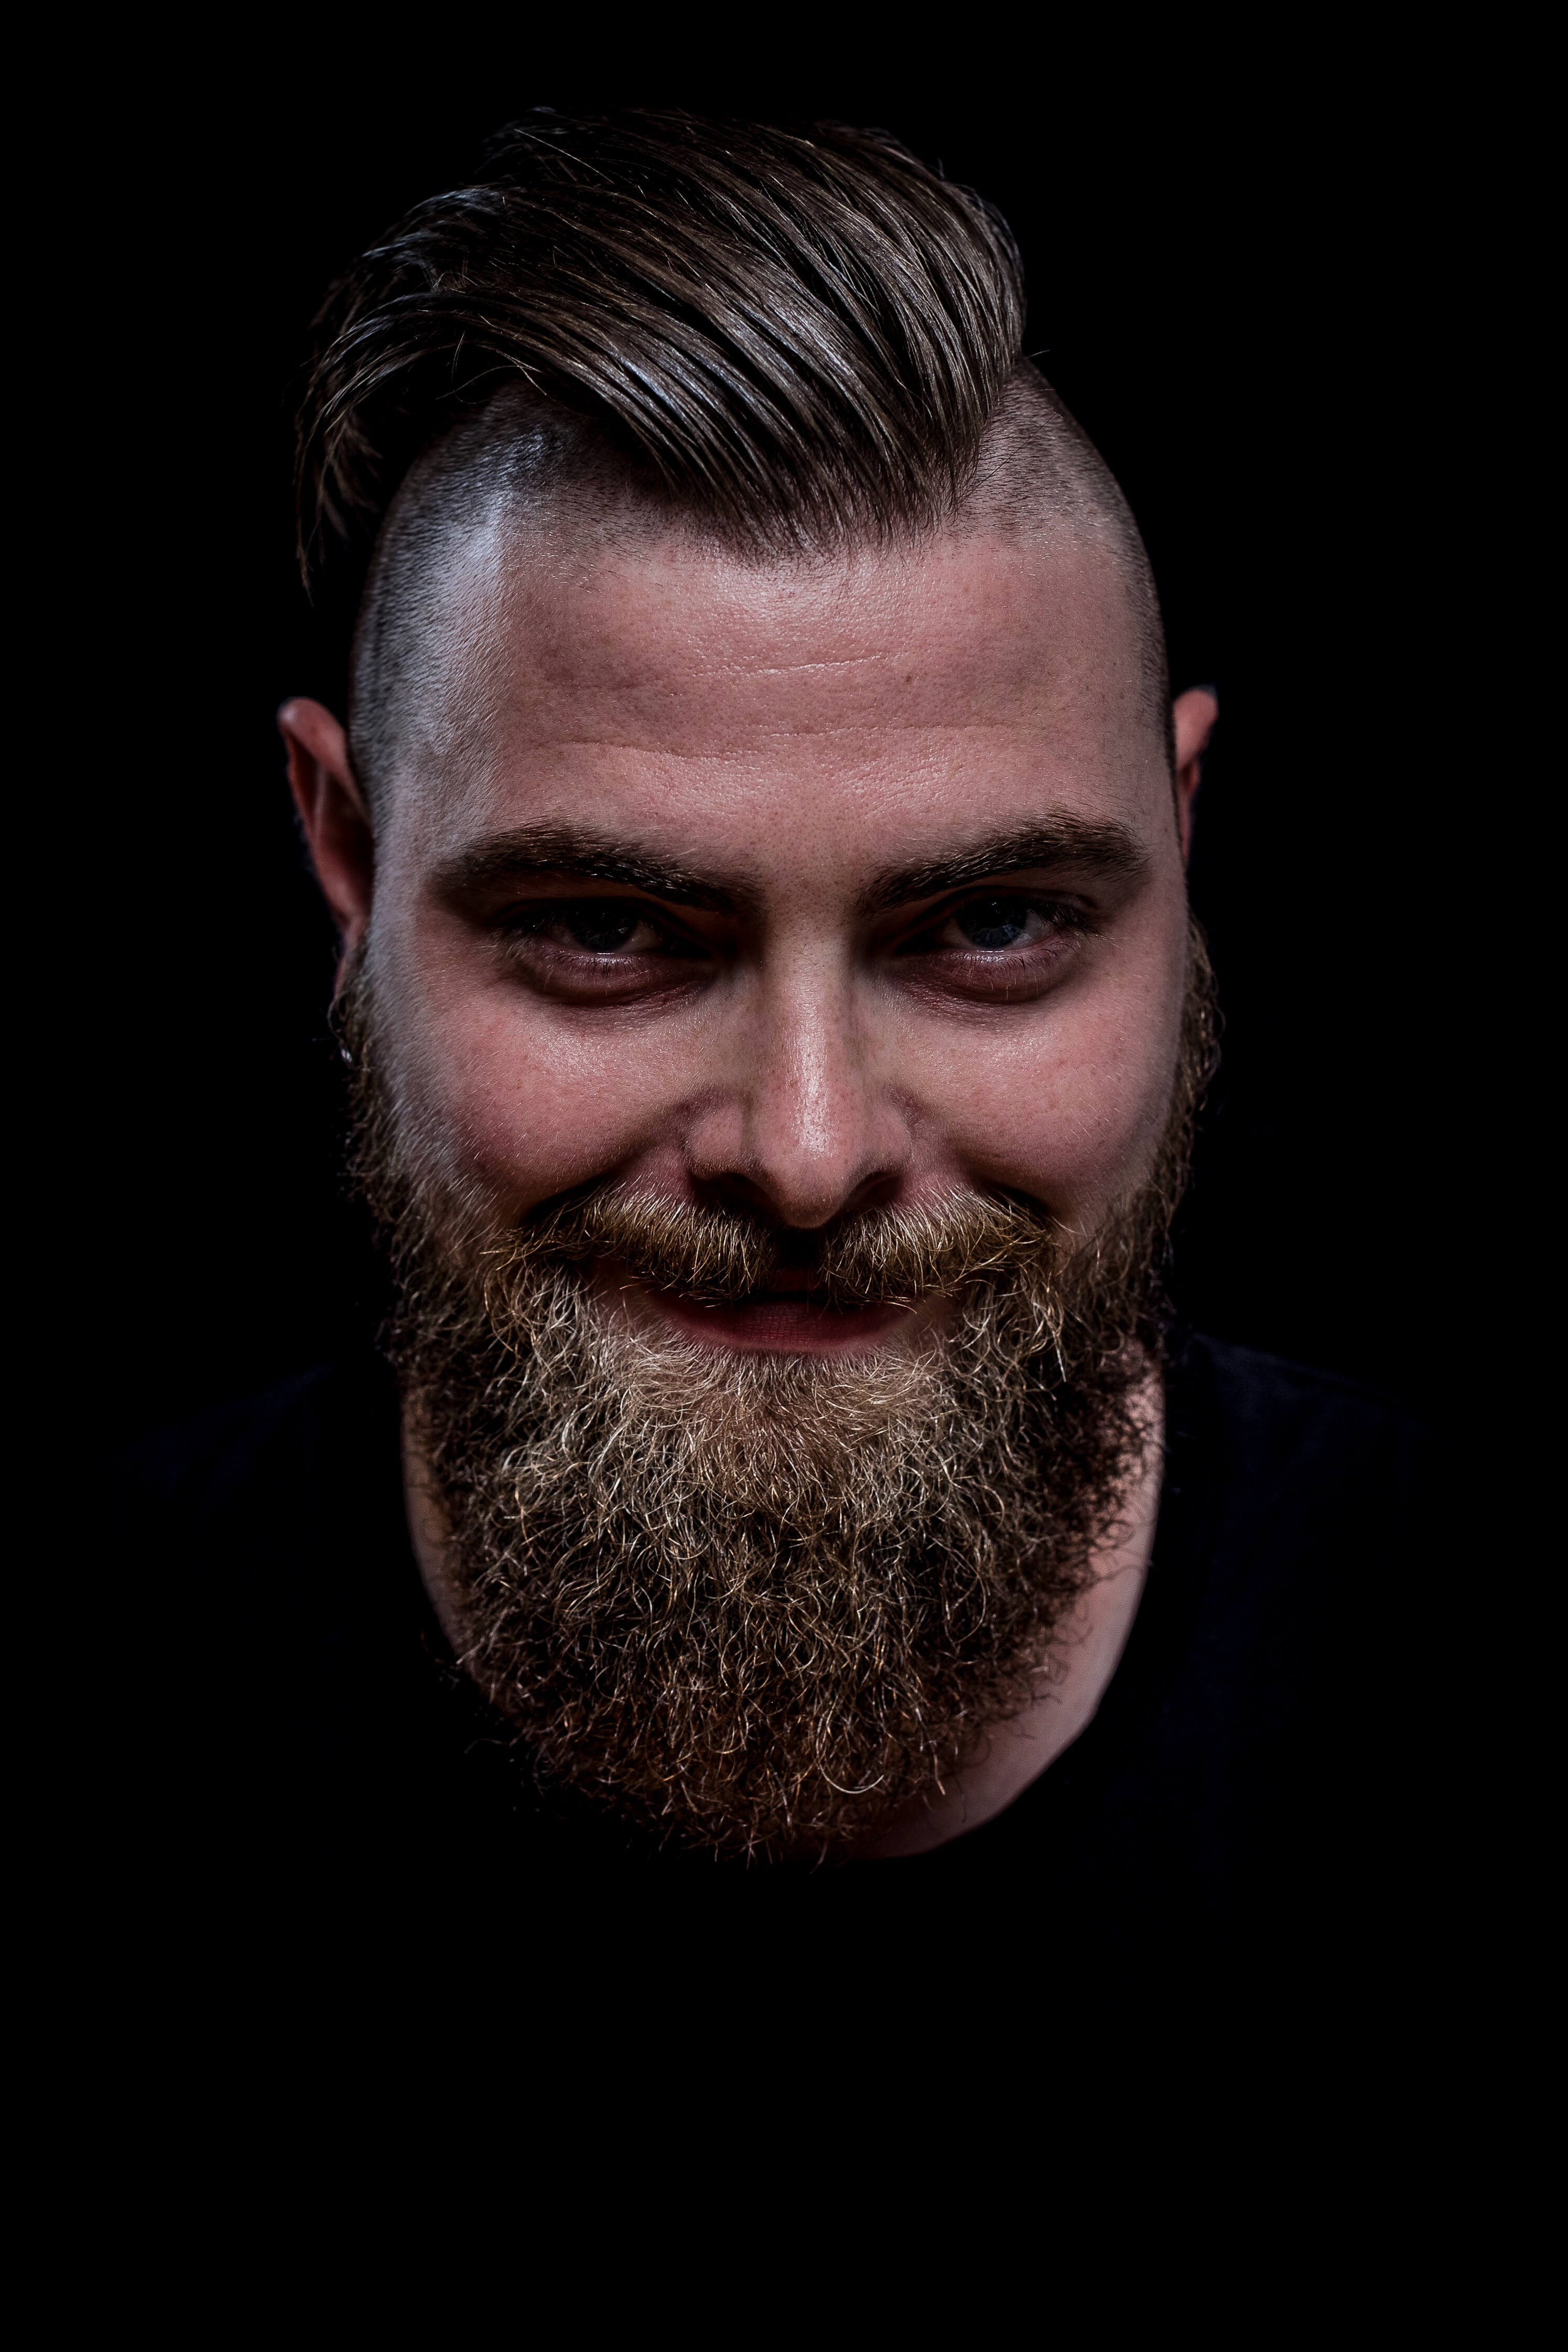 Go to Nicolai Fedderholdt's profile